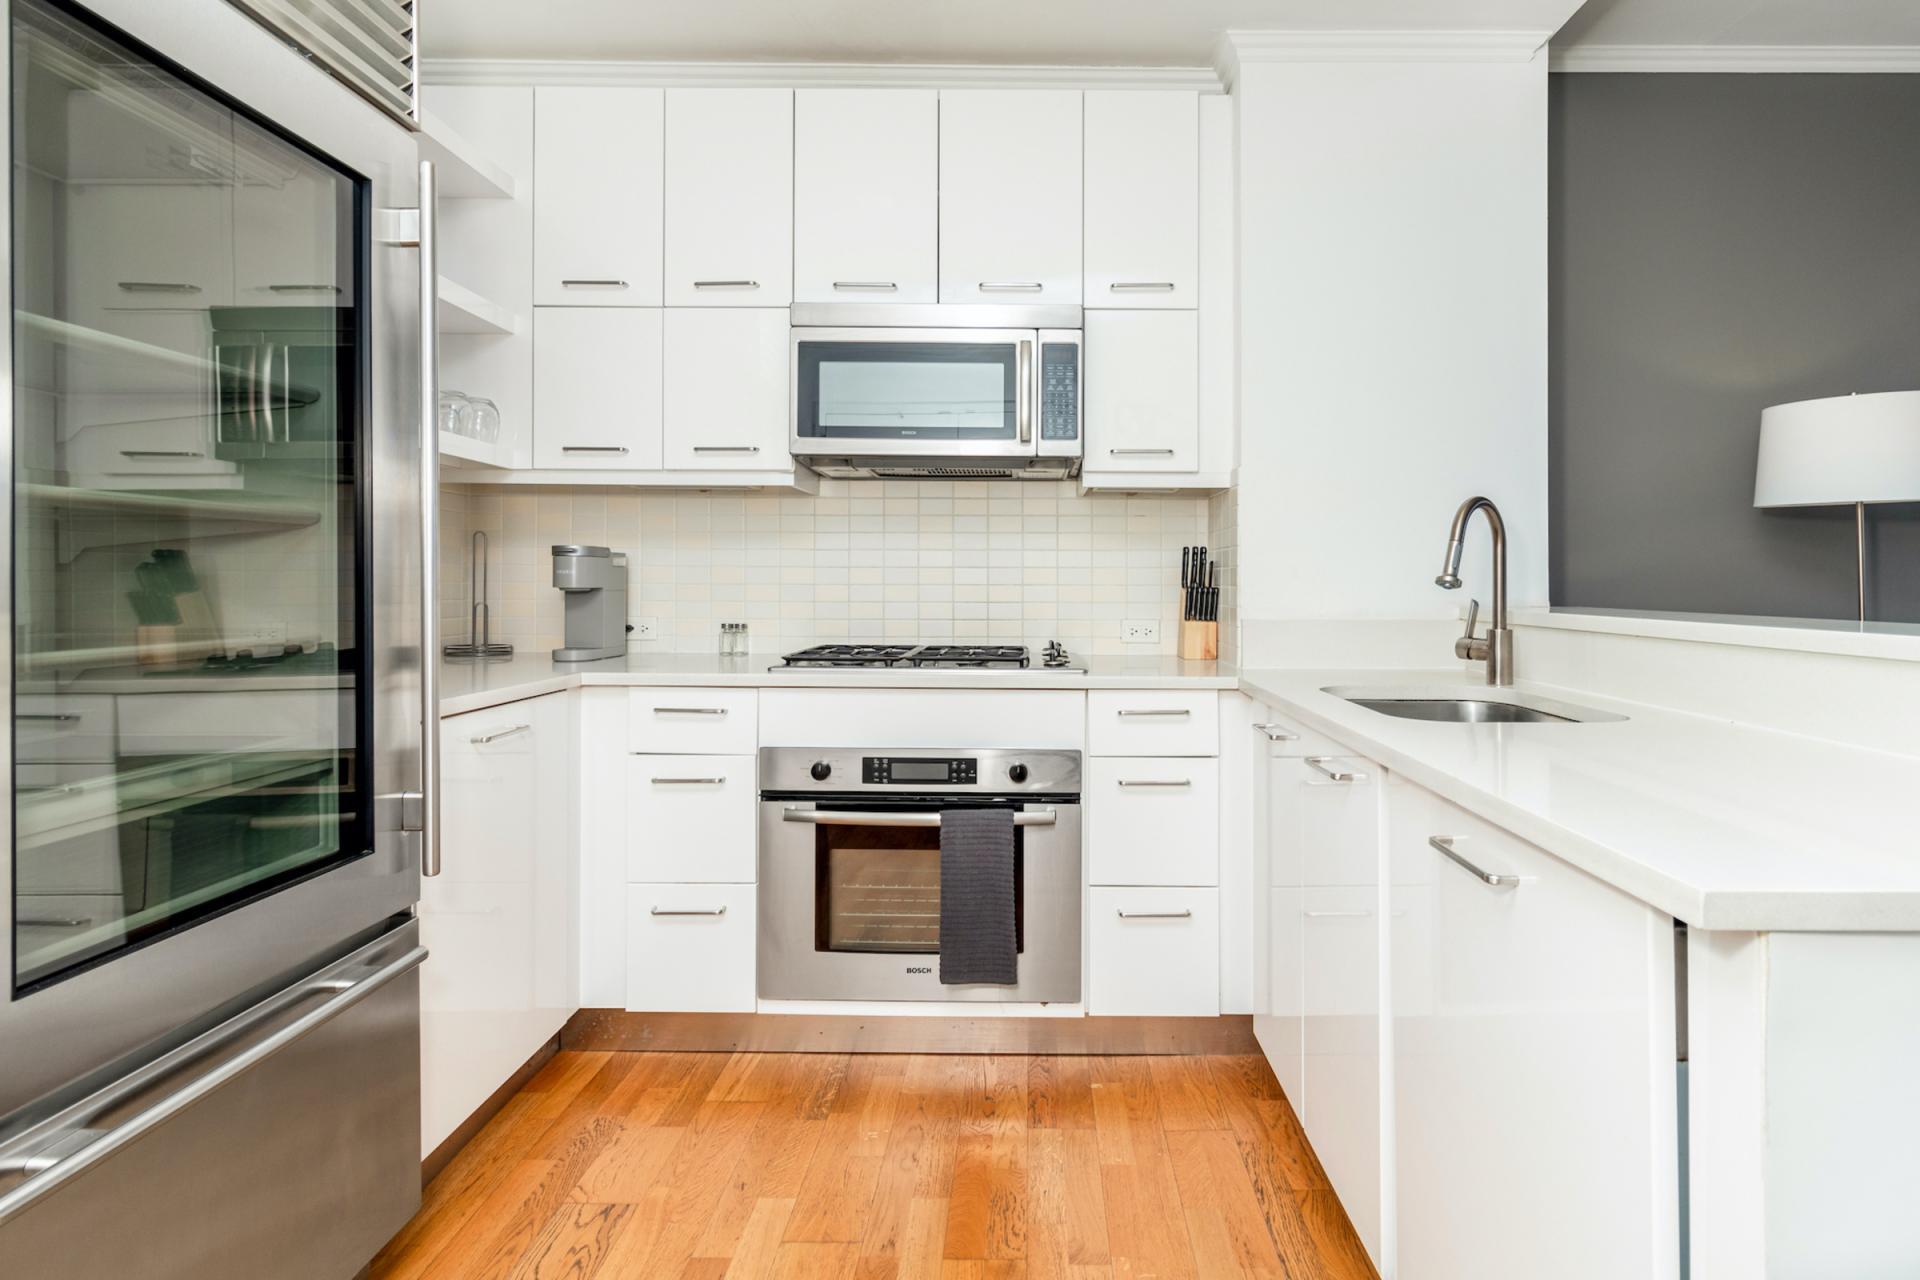 Kitchen at Apartments at Alexan 100, Belltown, Seattle